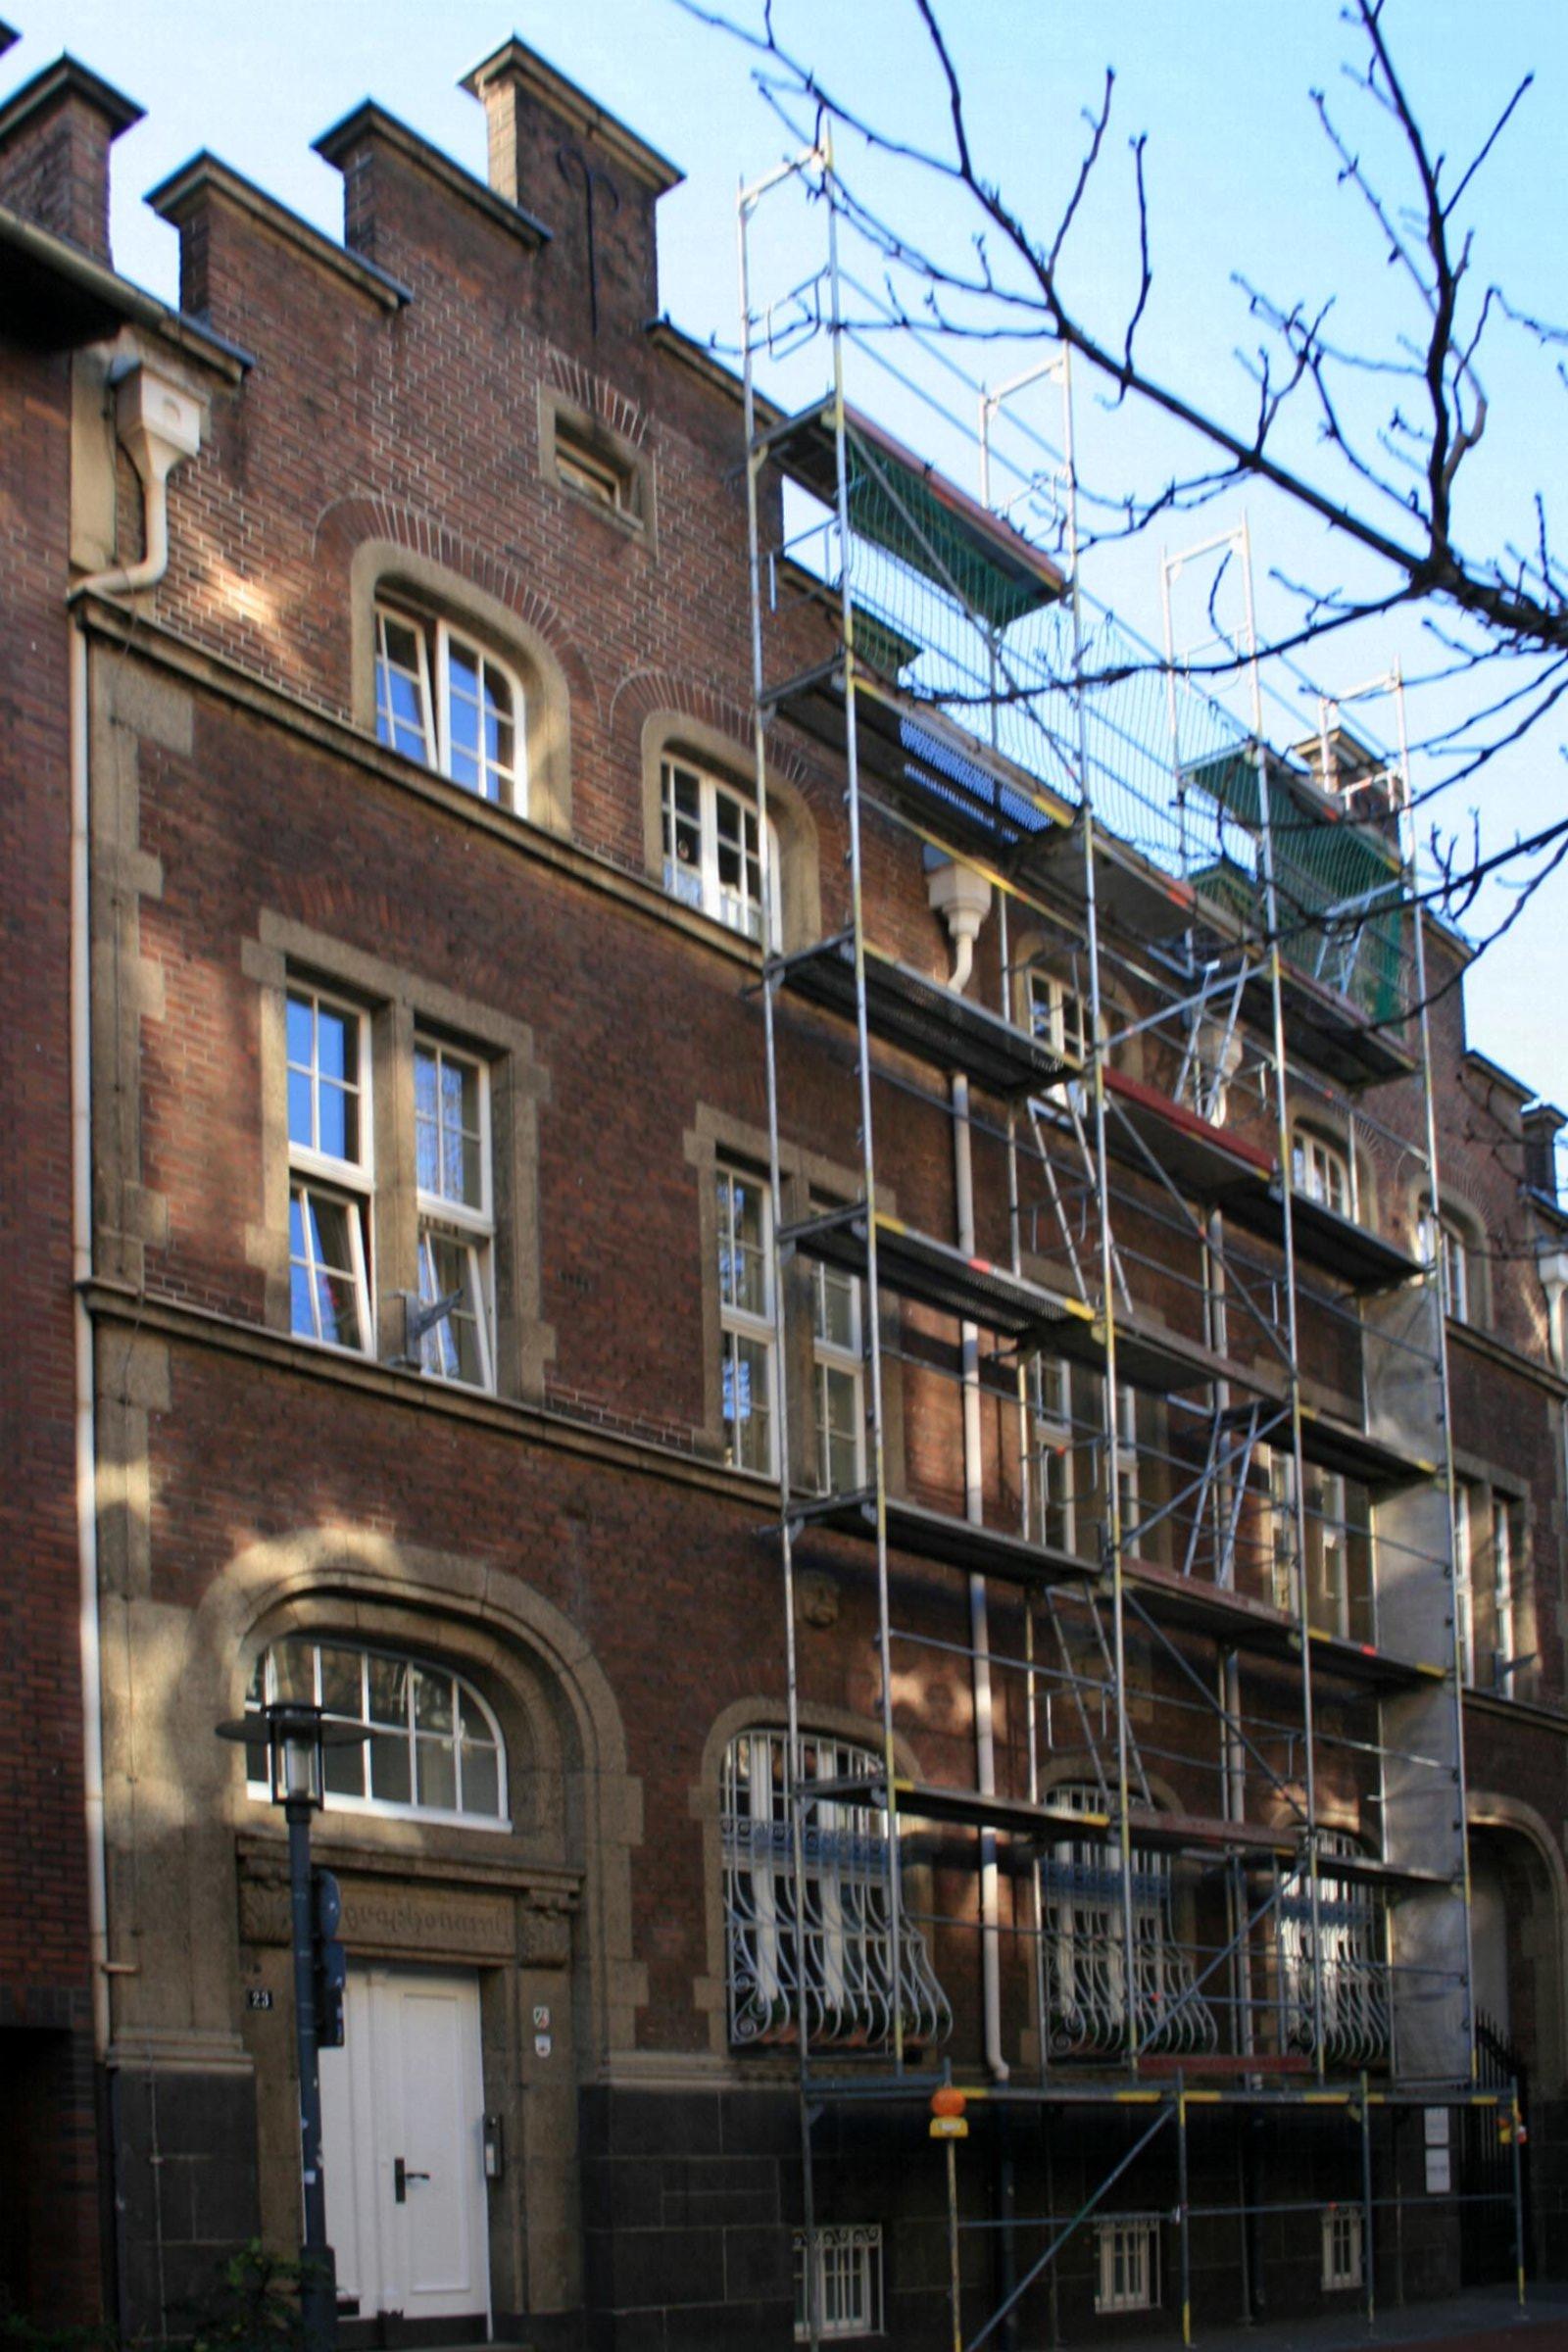 Liste Der Baudenkmaler In Neuss 1 400 1 499 Wikipedia